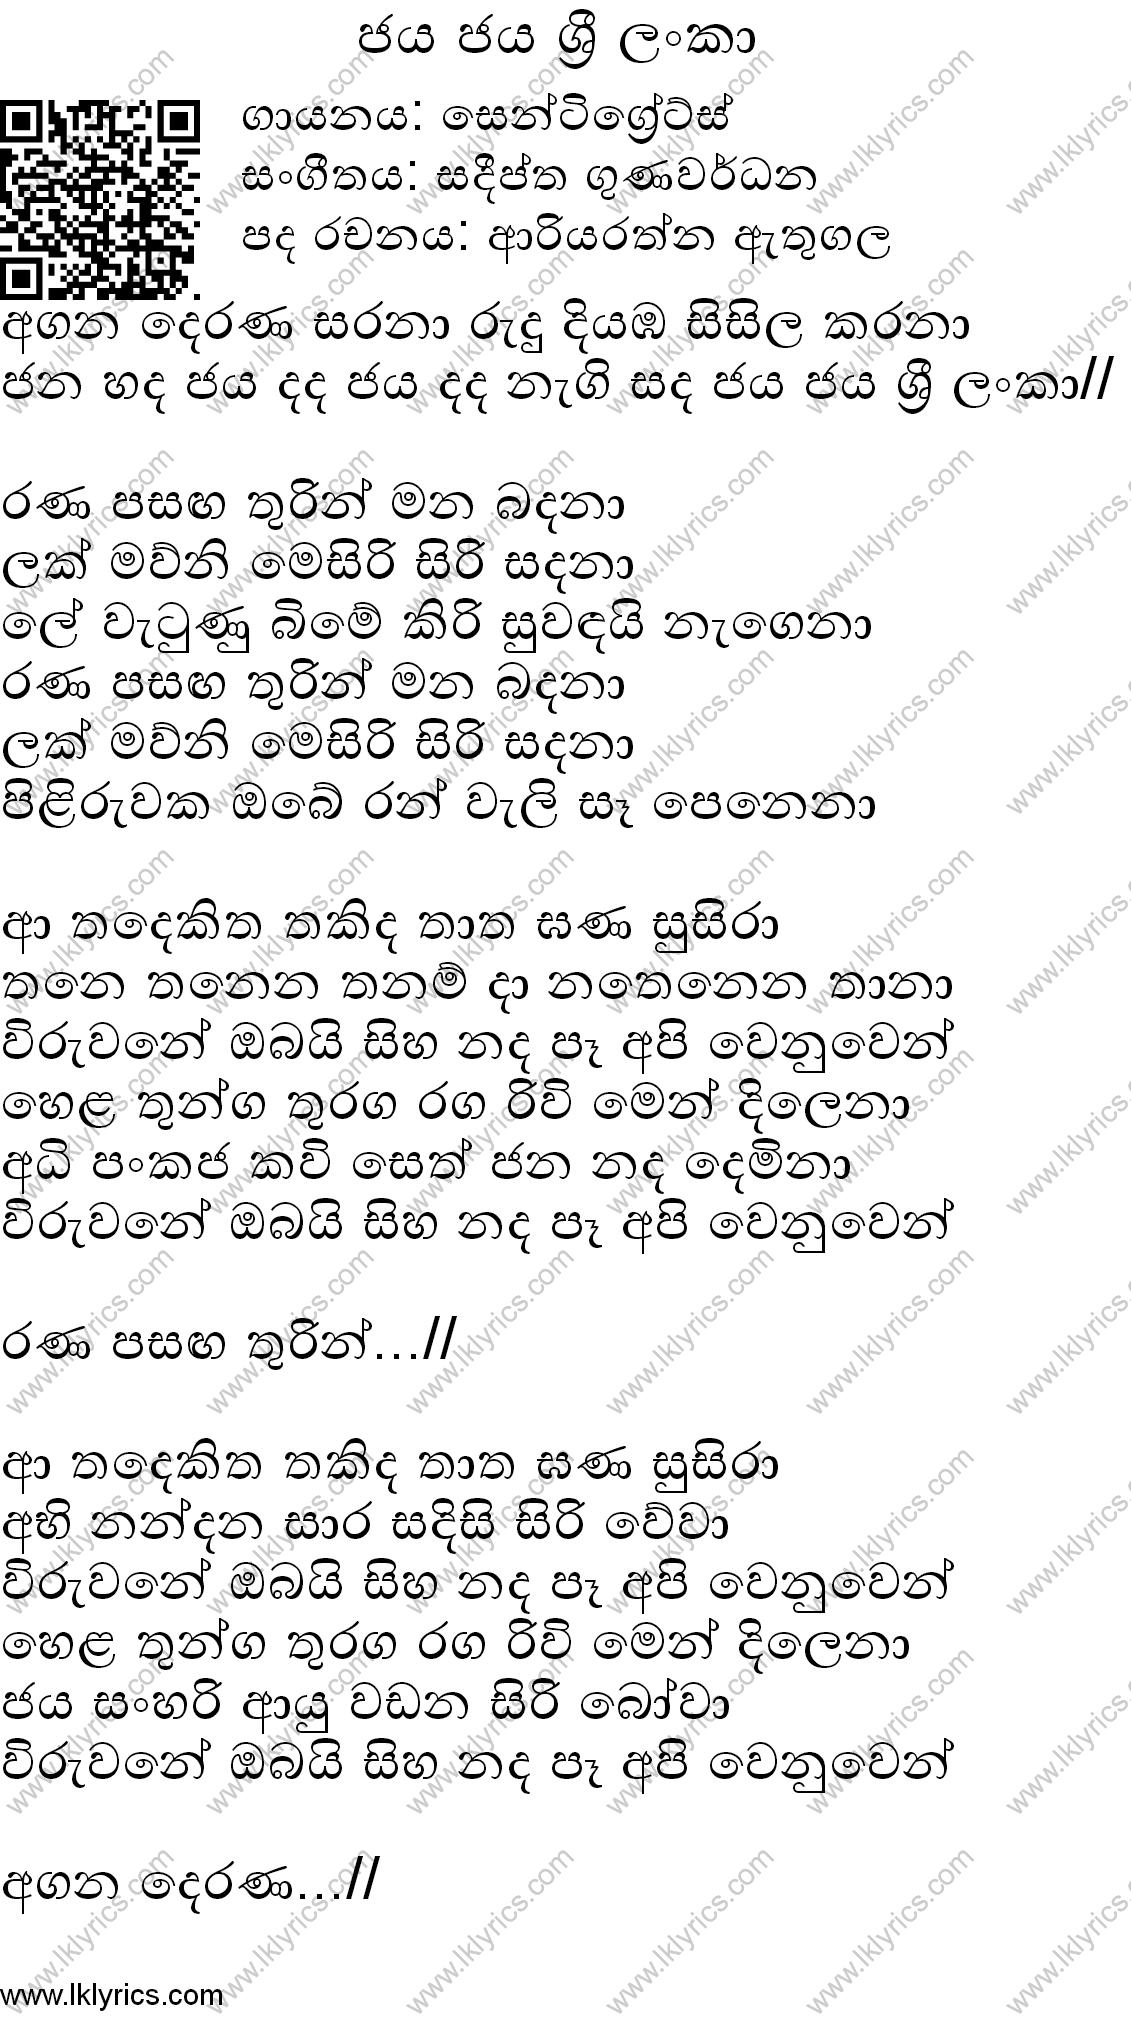 Jaya Sri Songs Download | Jaya Sri New Songs List | Best All MP3 Free Online - Hungama